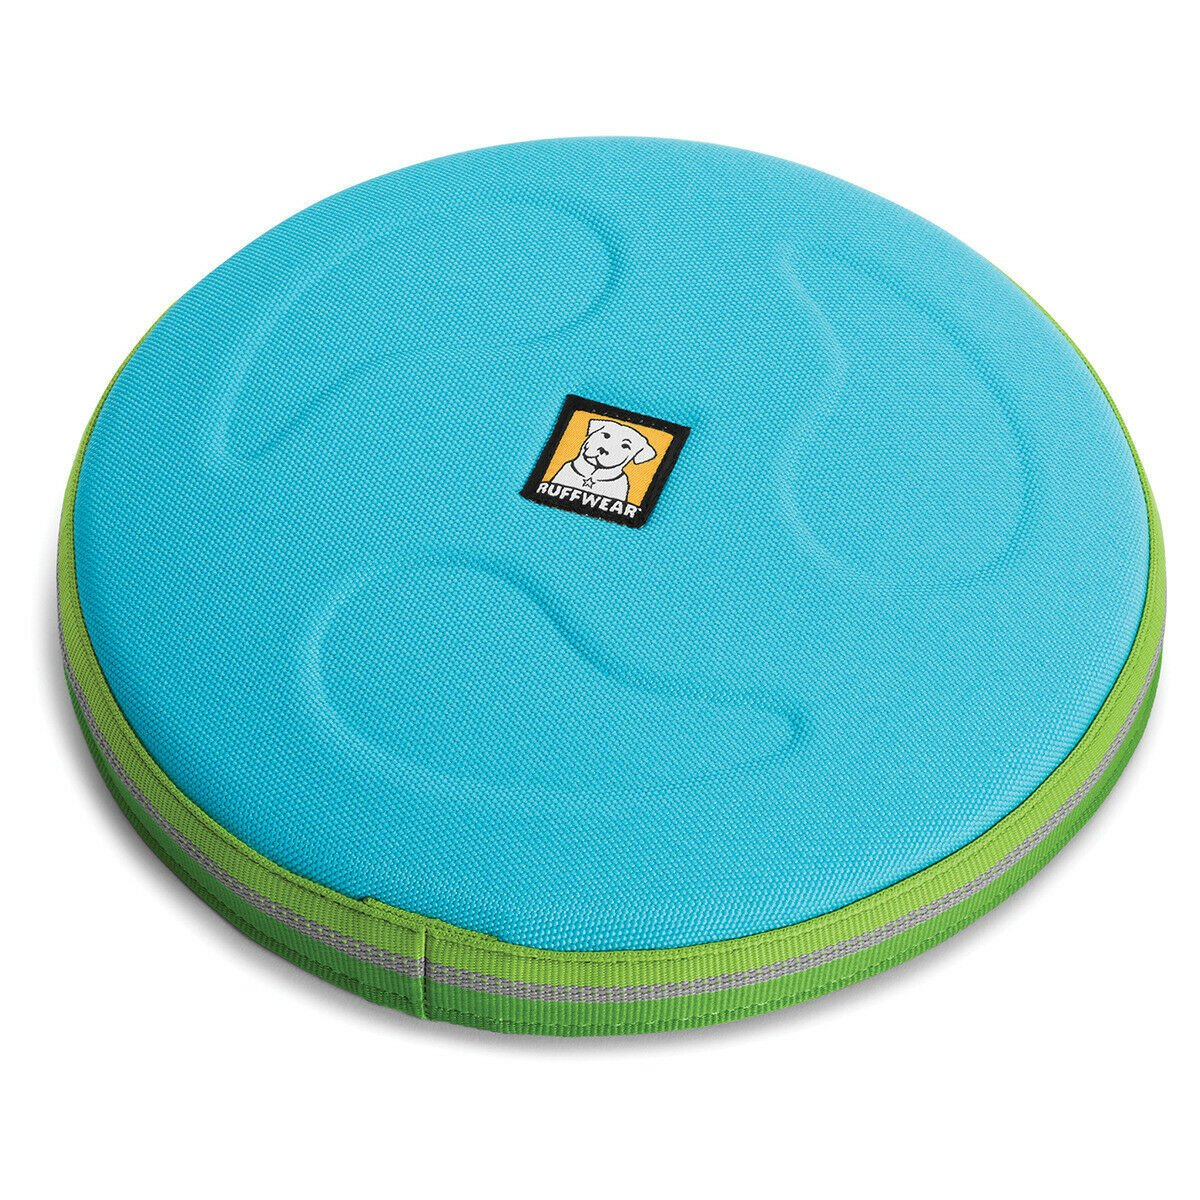 Ruffwear Hundespielzeug Hover Craft™ Frisbee, L, Blue Atoll - Ø 23 cm